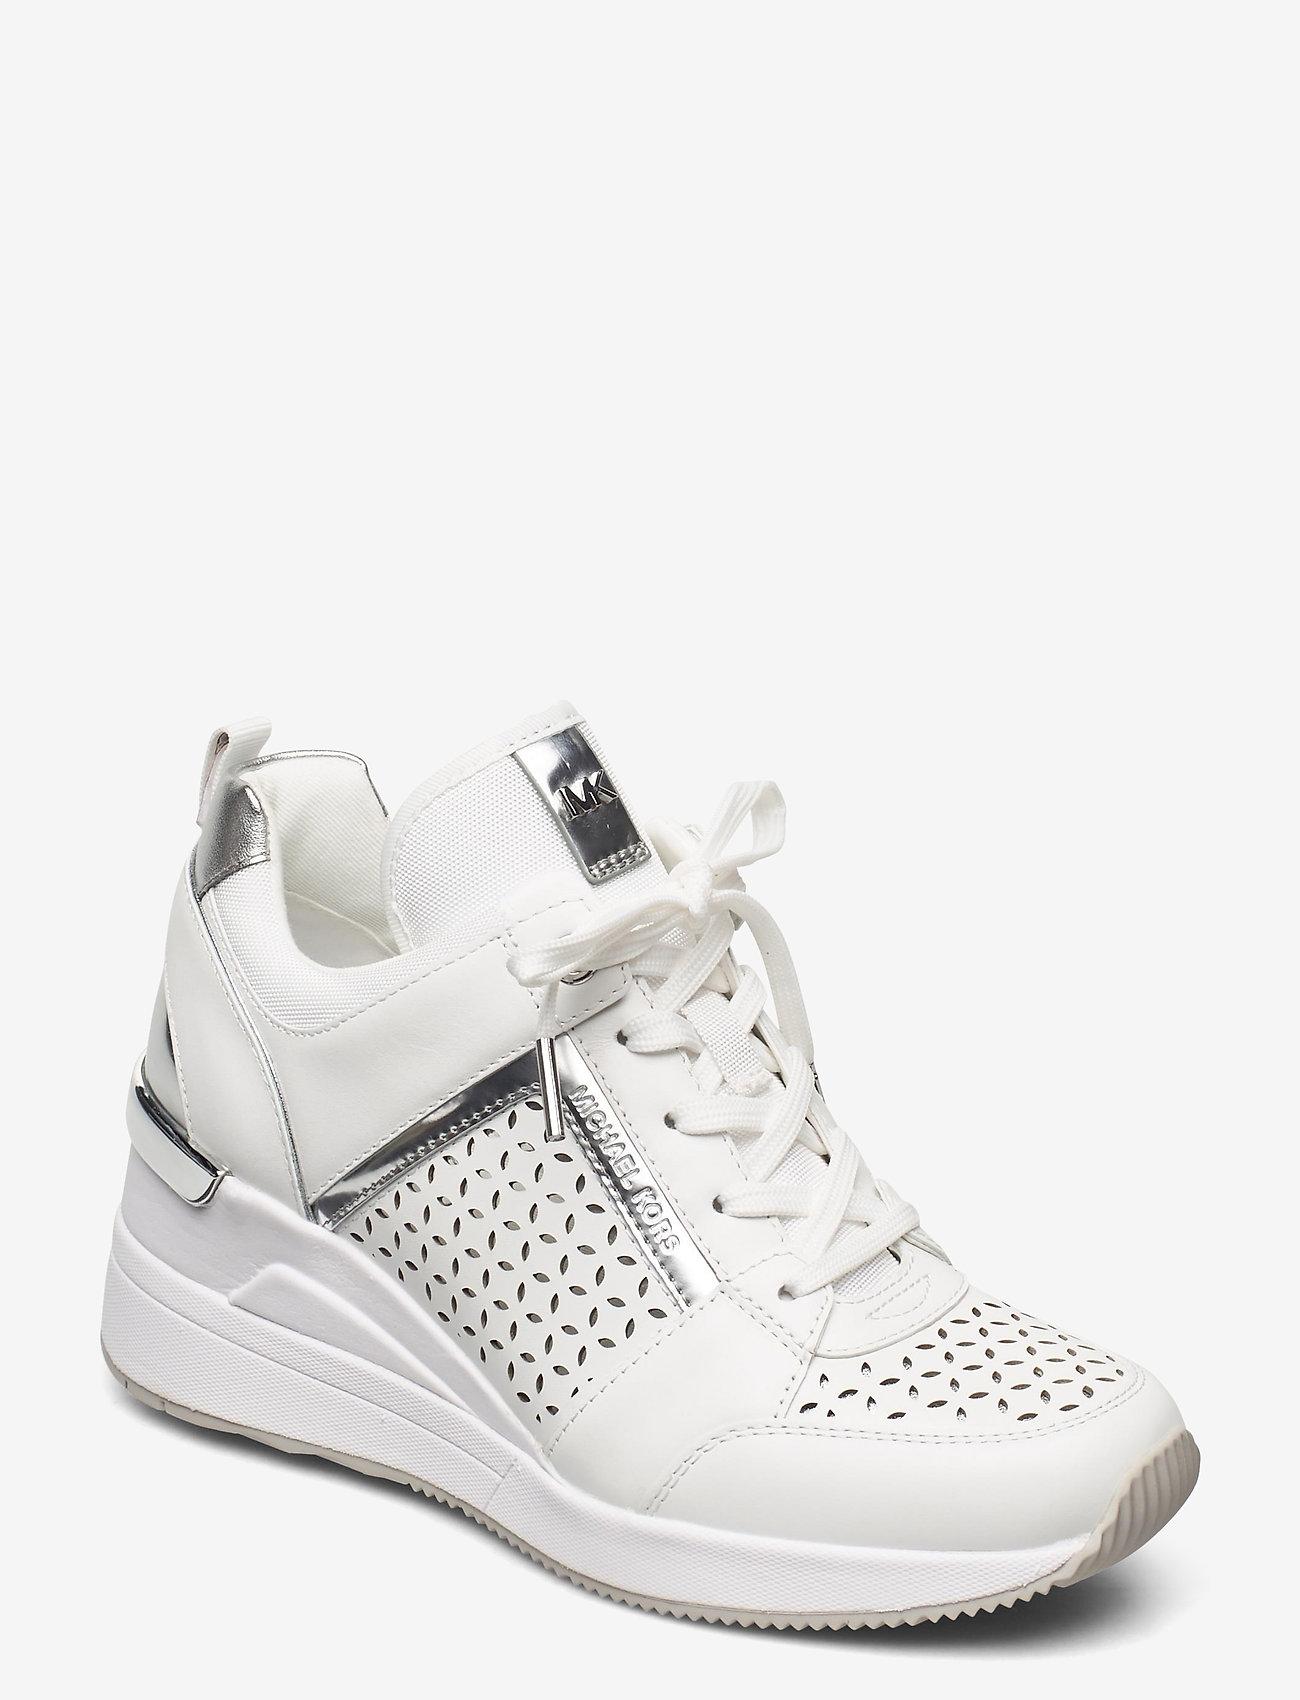 Michael Kors Shoes - GEORGIE TRAINER - hoge sneakers - optic white - 0